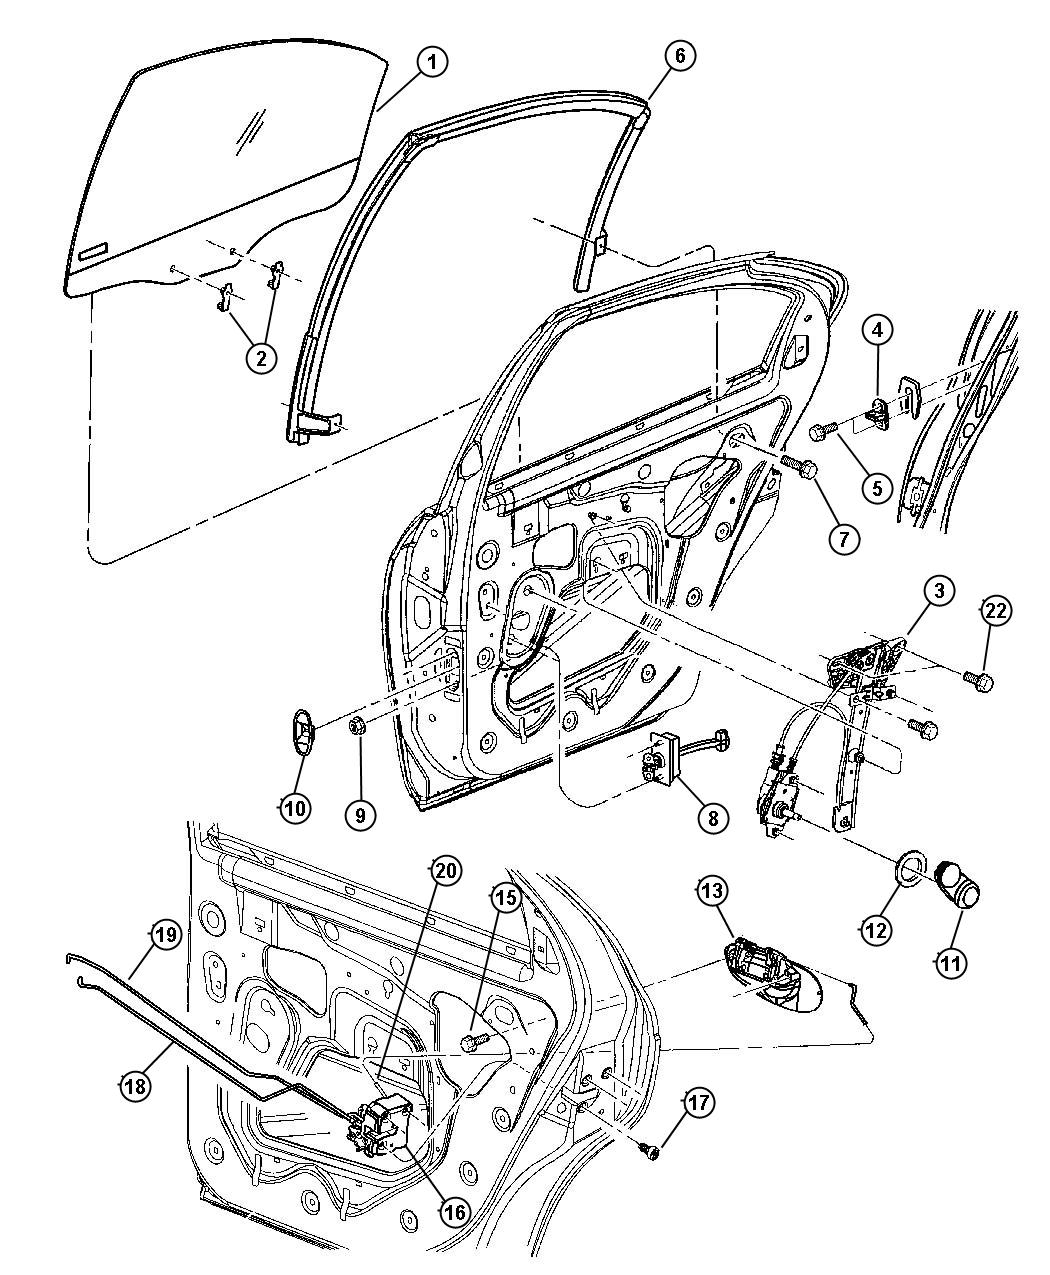 Dodge Avenger Handle Window Regulator Trim All Trim Codes Color Taupe Exterior